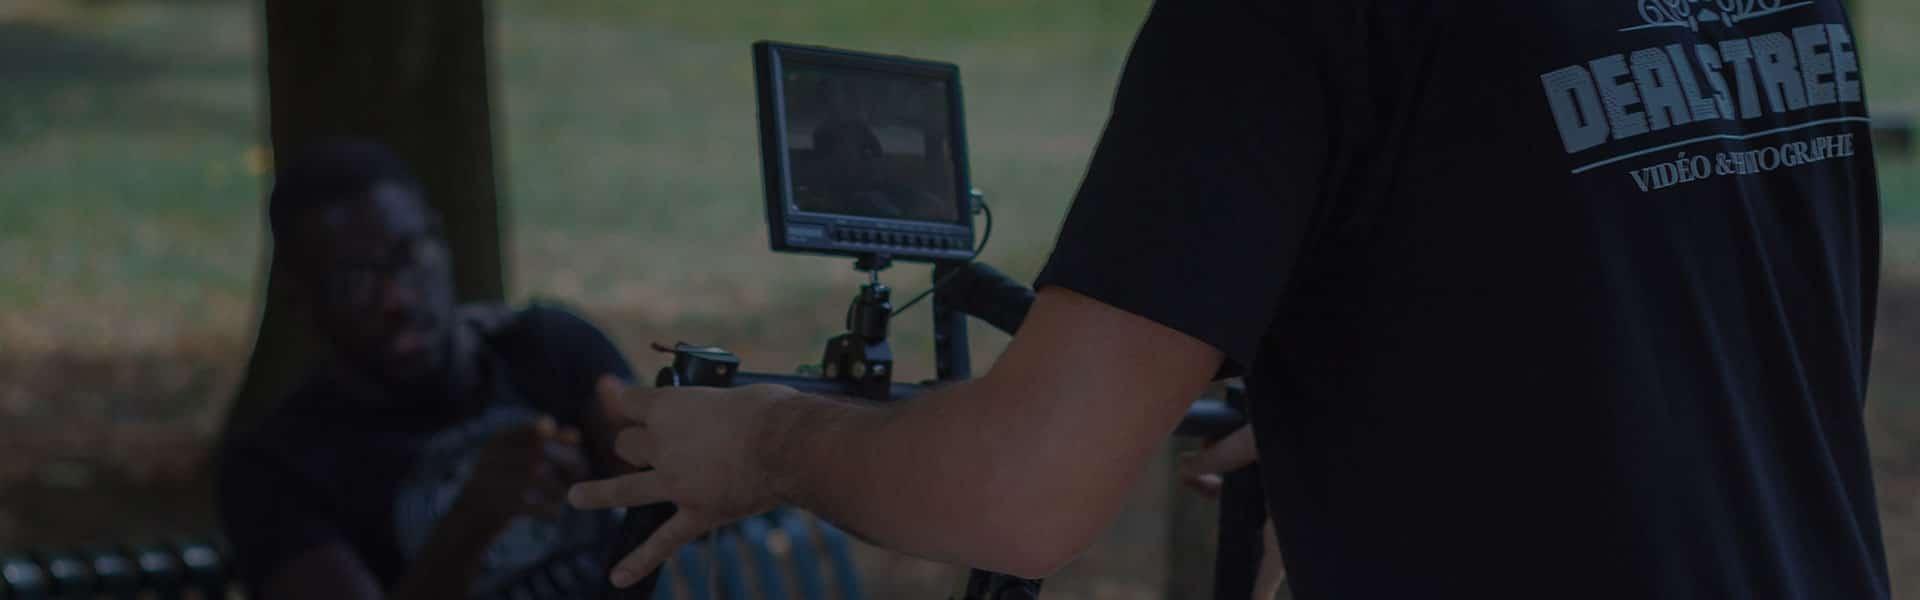 Image - Backstage tournage vidéo